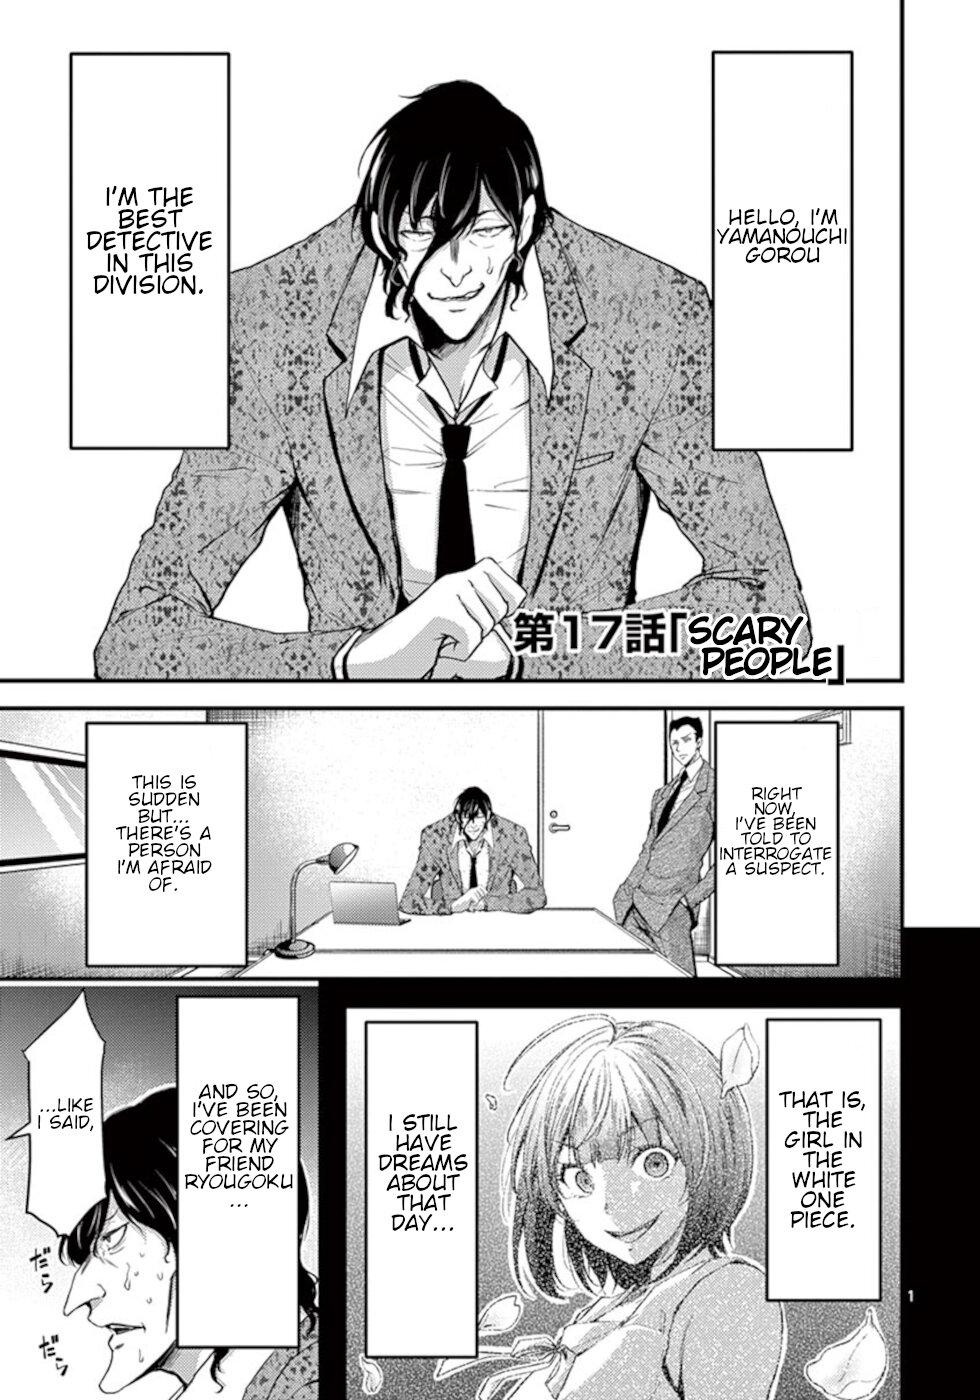 https://manga.mangadogs.com/comics/pic4/12/30348/2643293/d9d091e2a4d0ad5090774d0790d99a9a.jpg Page 1